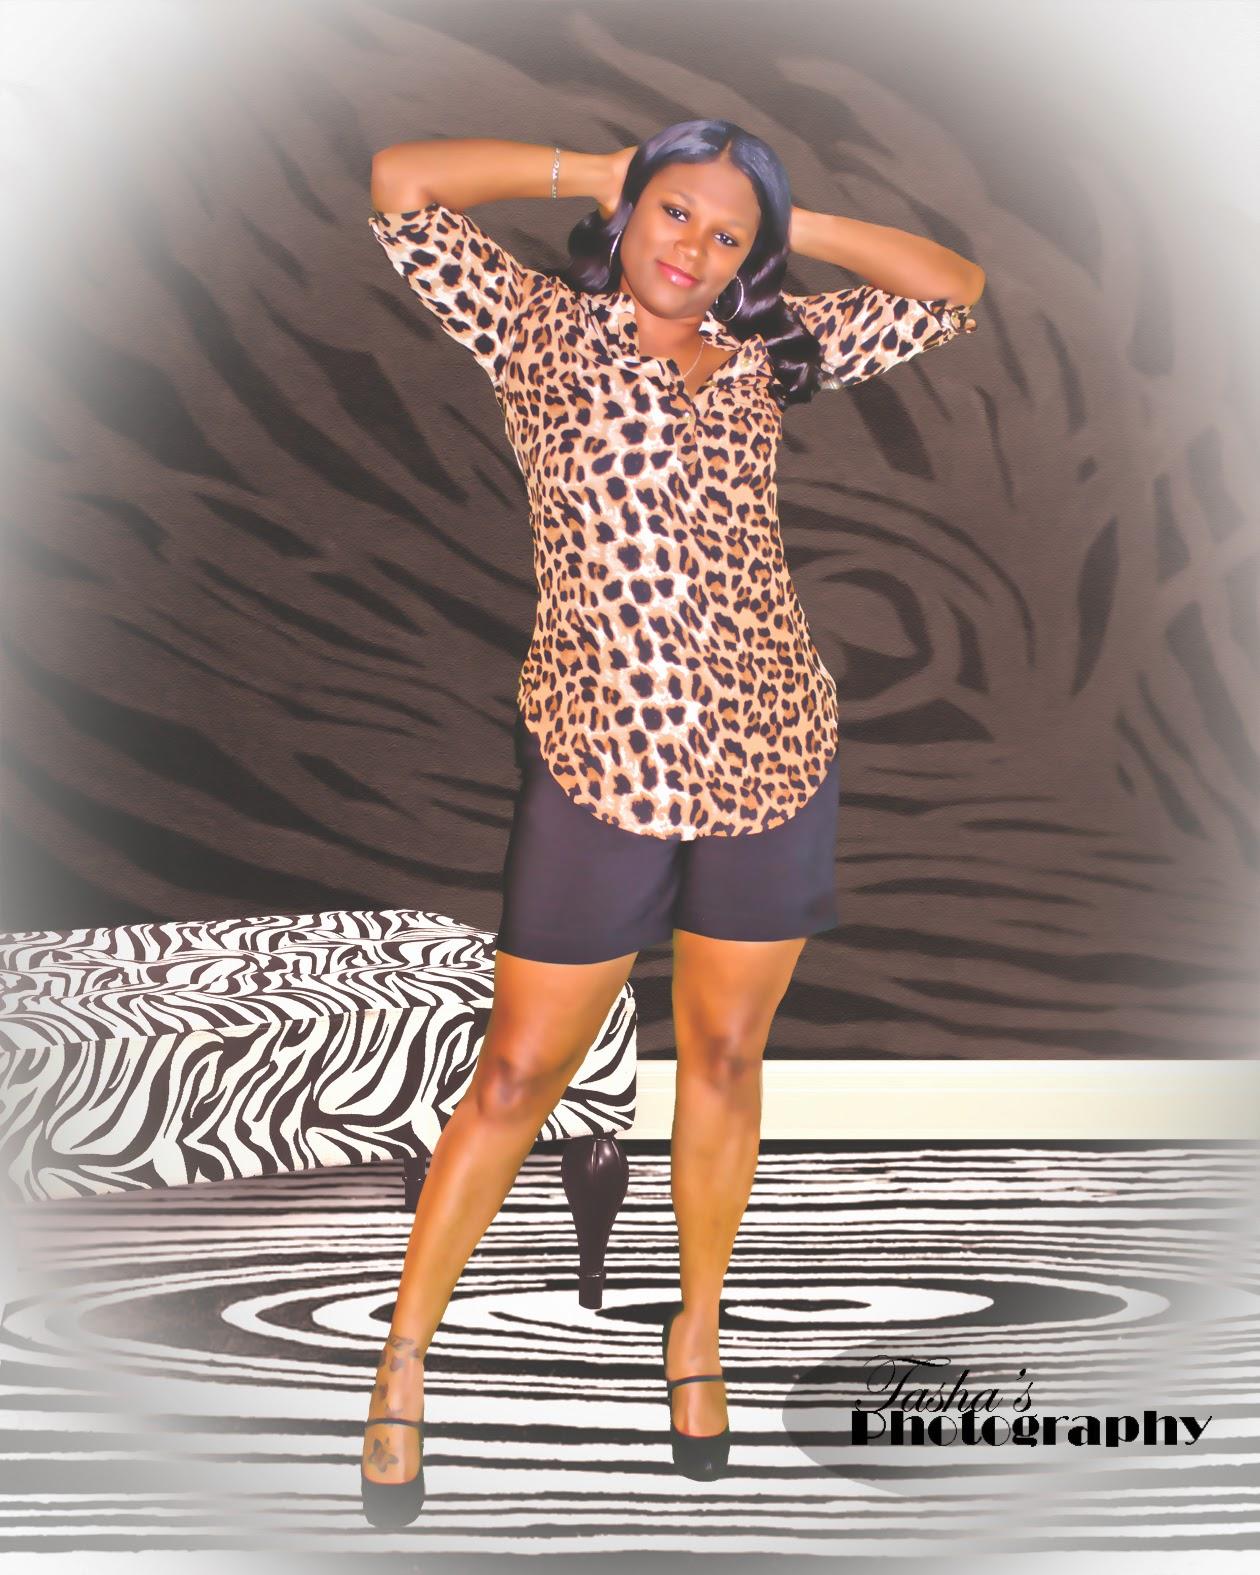 Tasha Wright